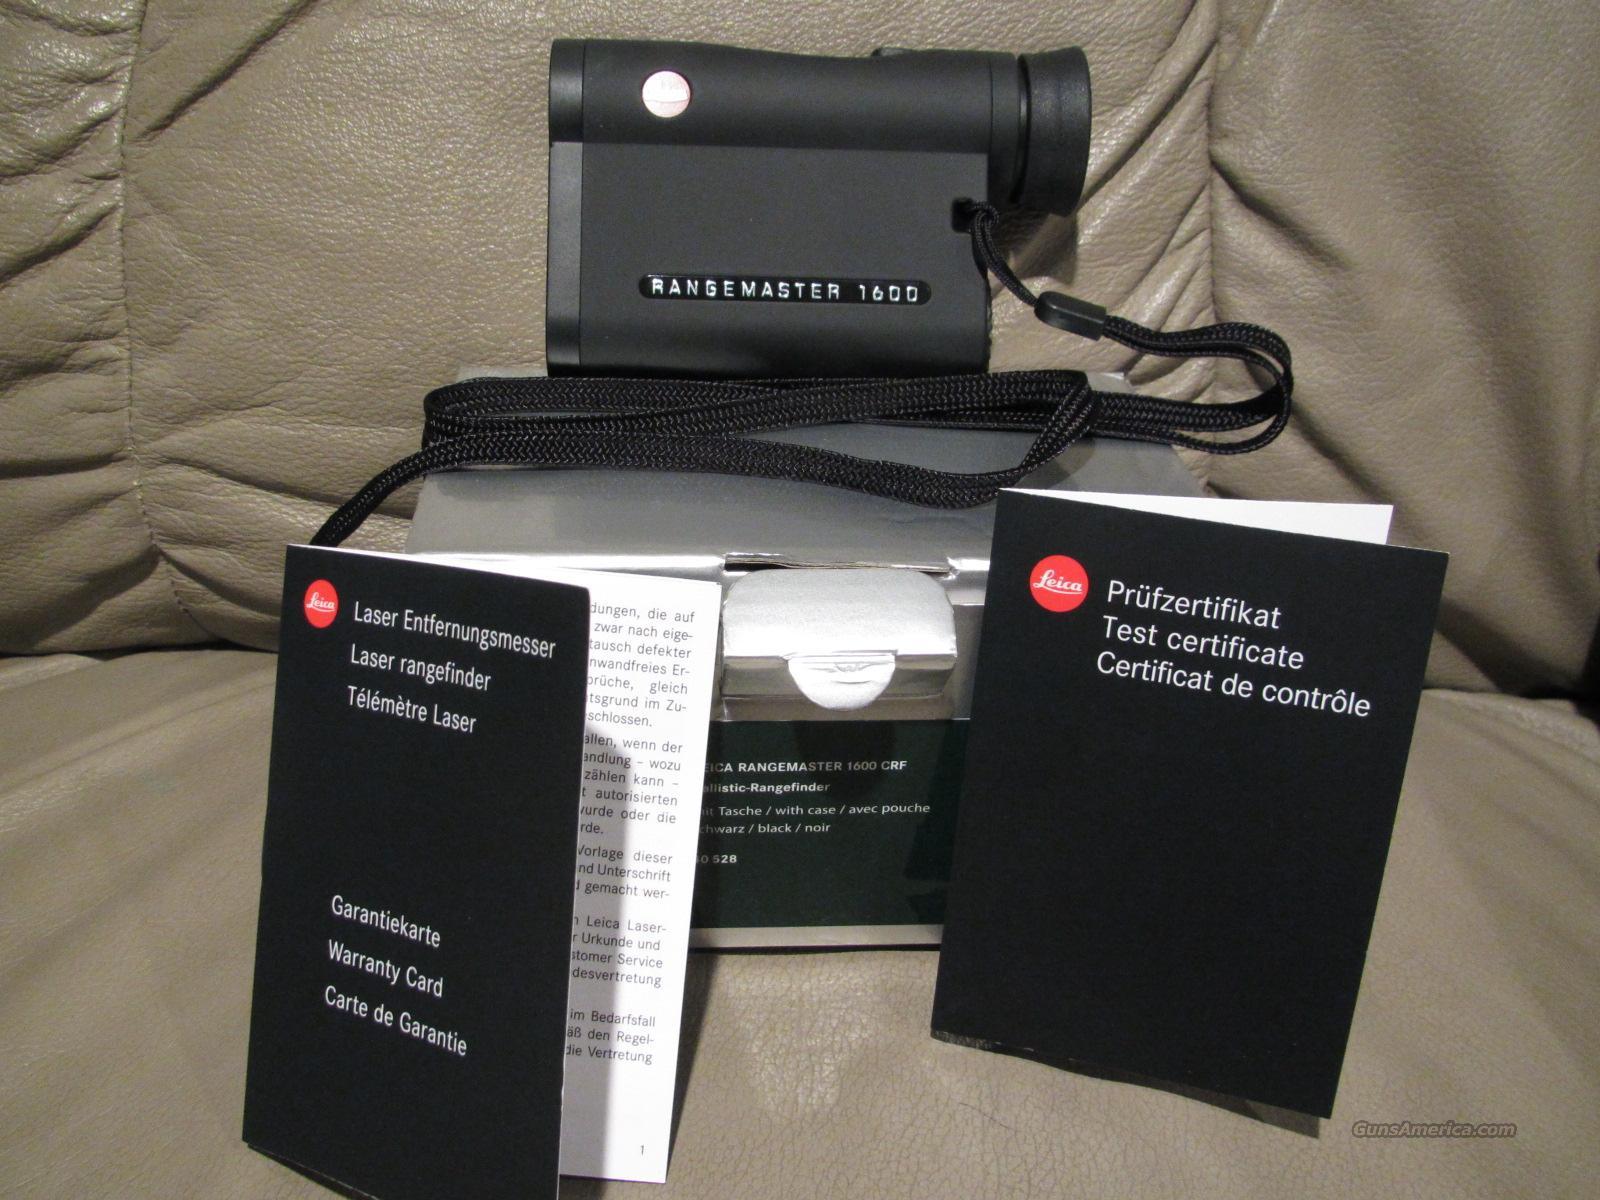 Leica Entfernungsmesser Crf 1600 : Leica rangefinders